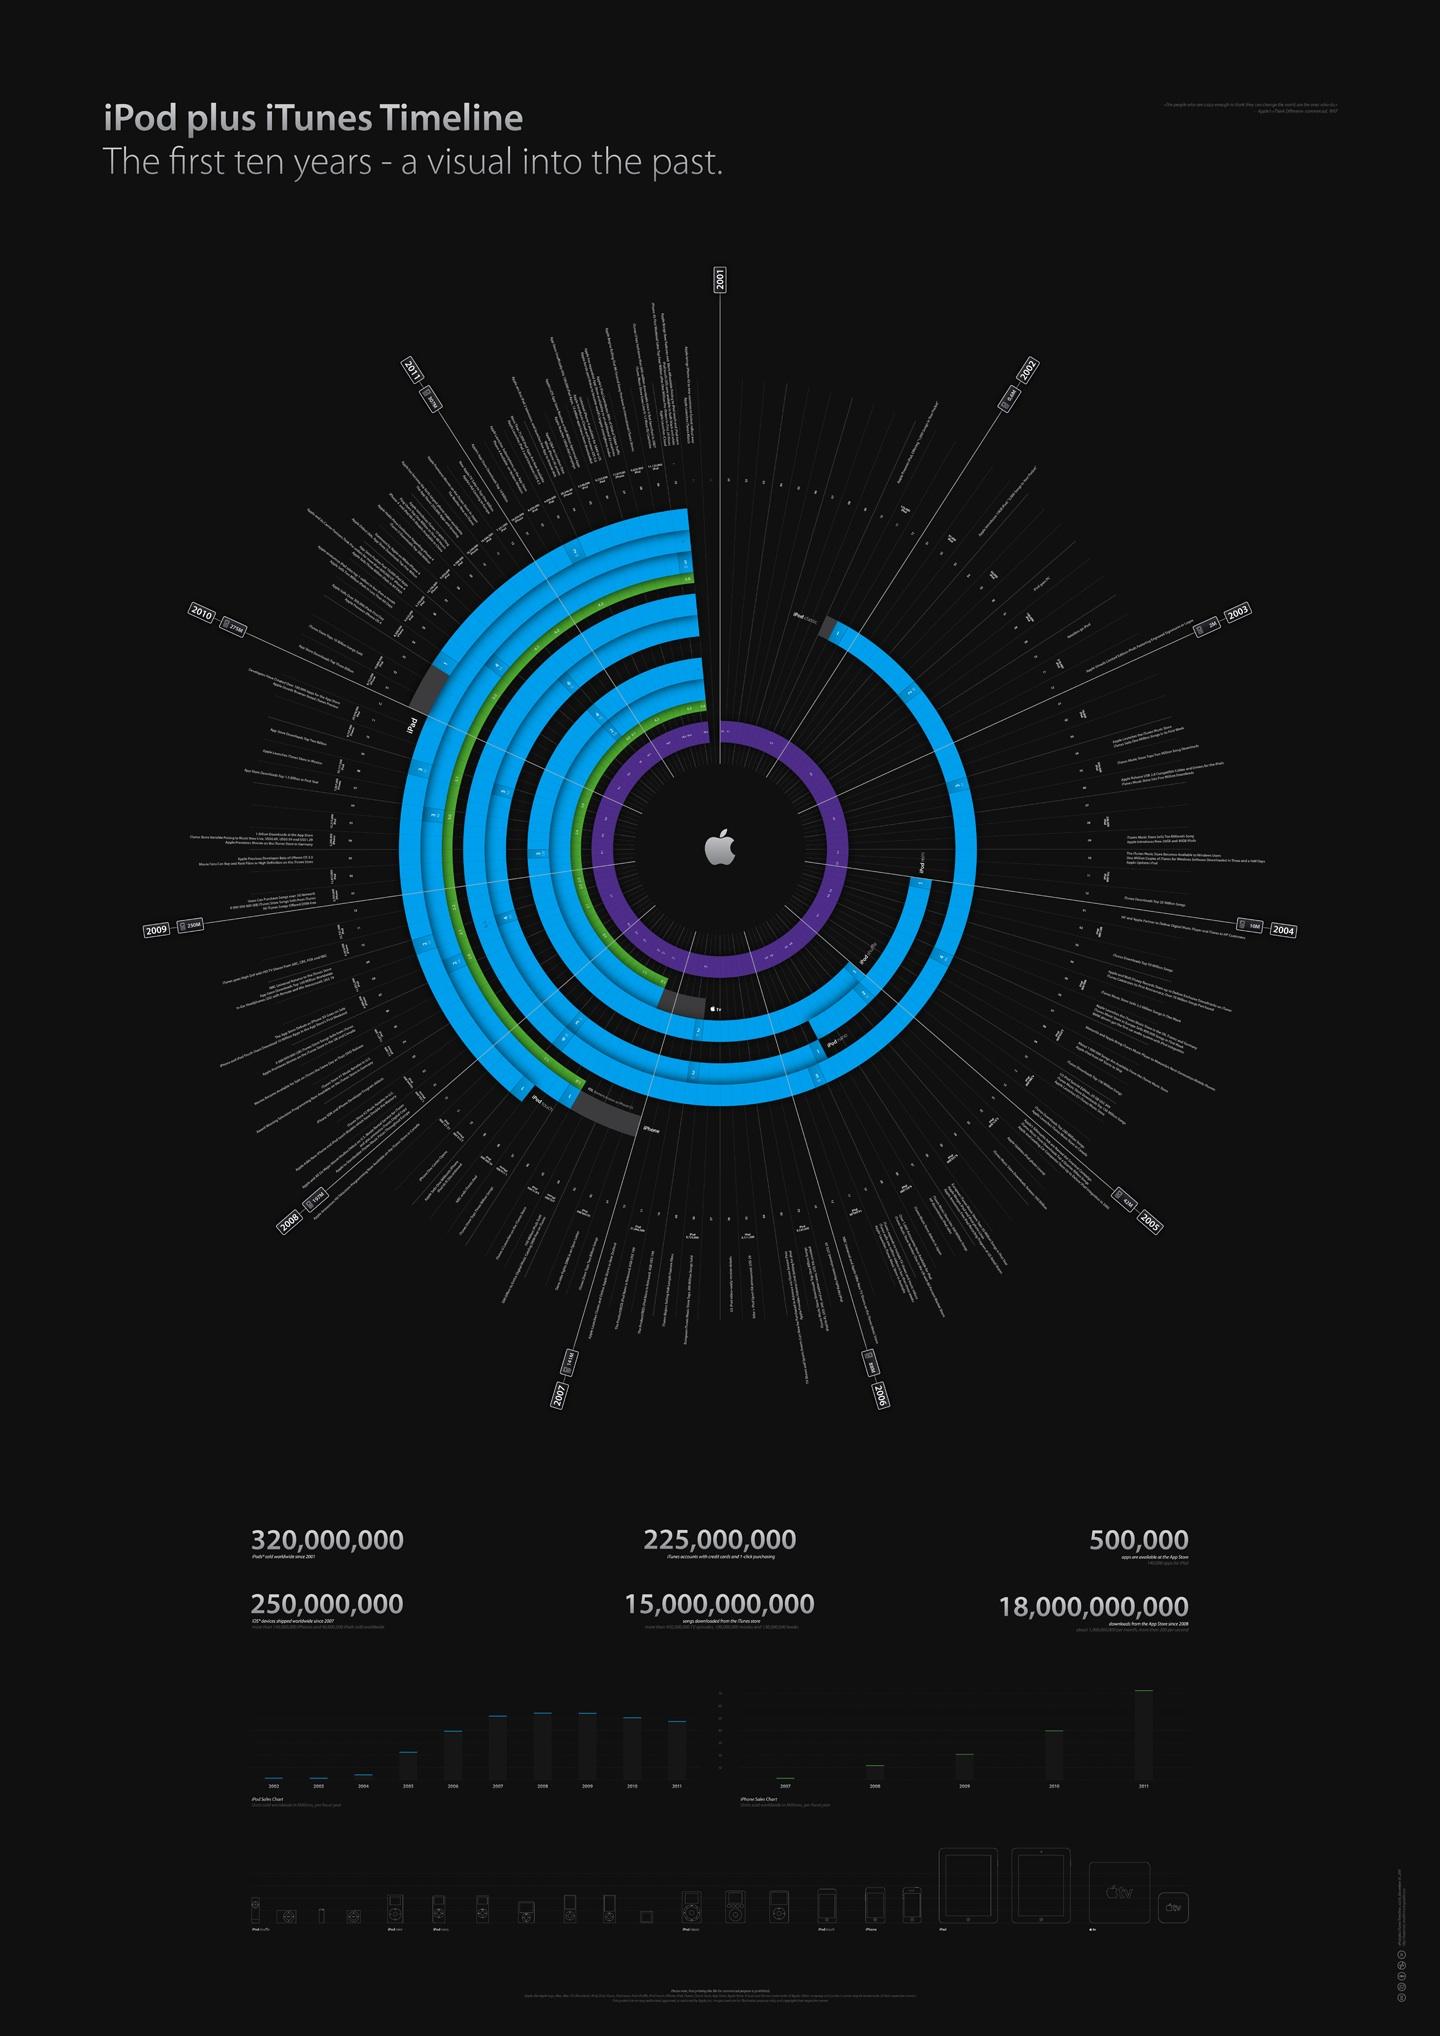 iPod und iTunes Infografik